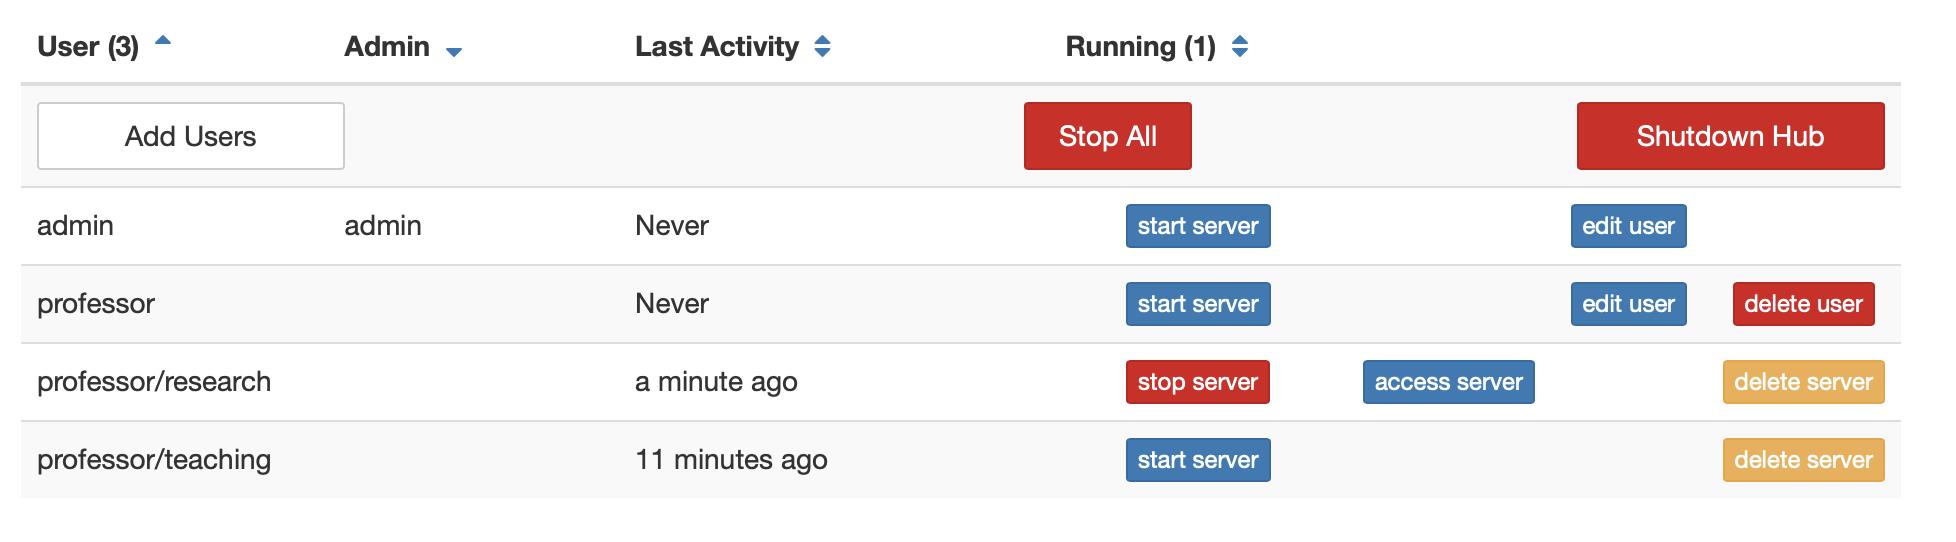 Configuring user environments — JupyterHub 1 0 0 documentation